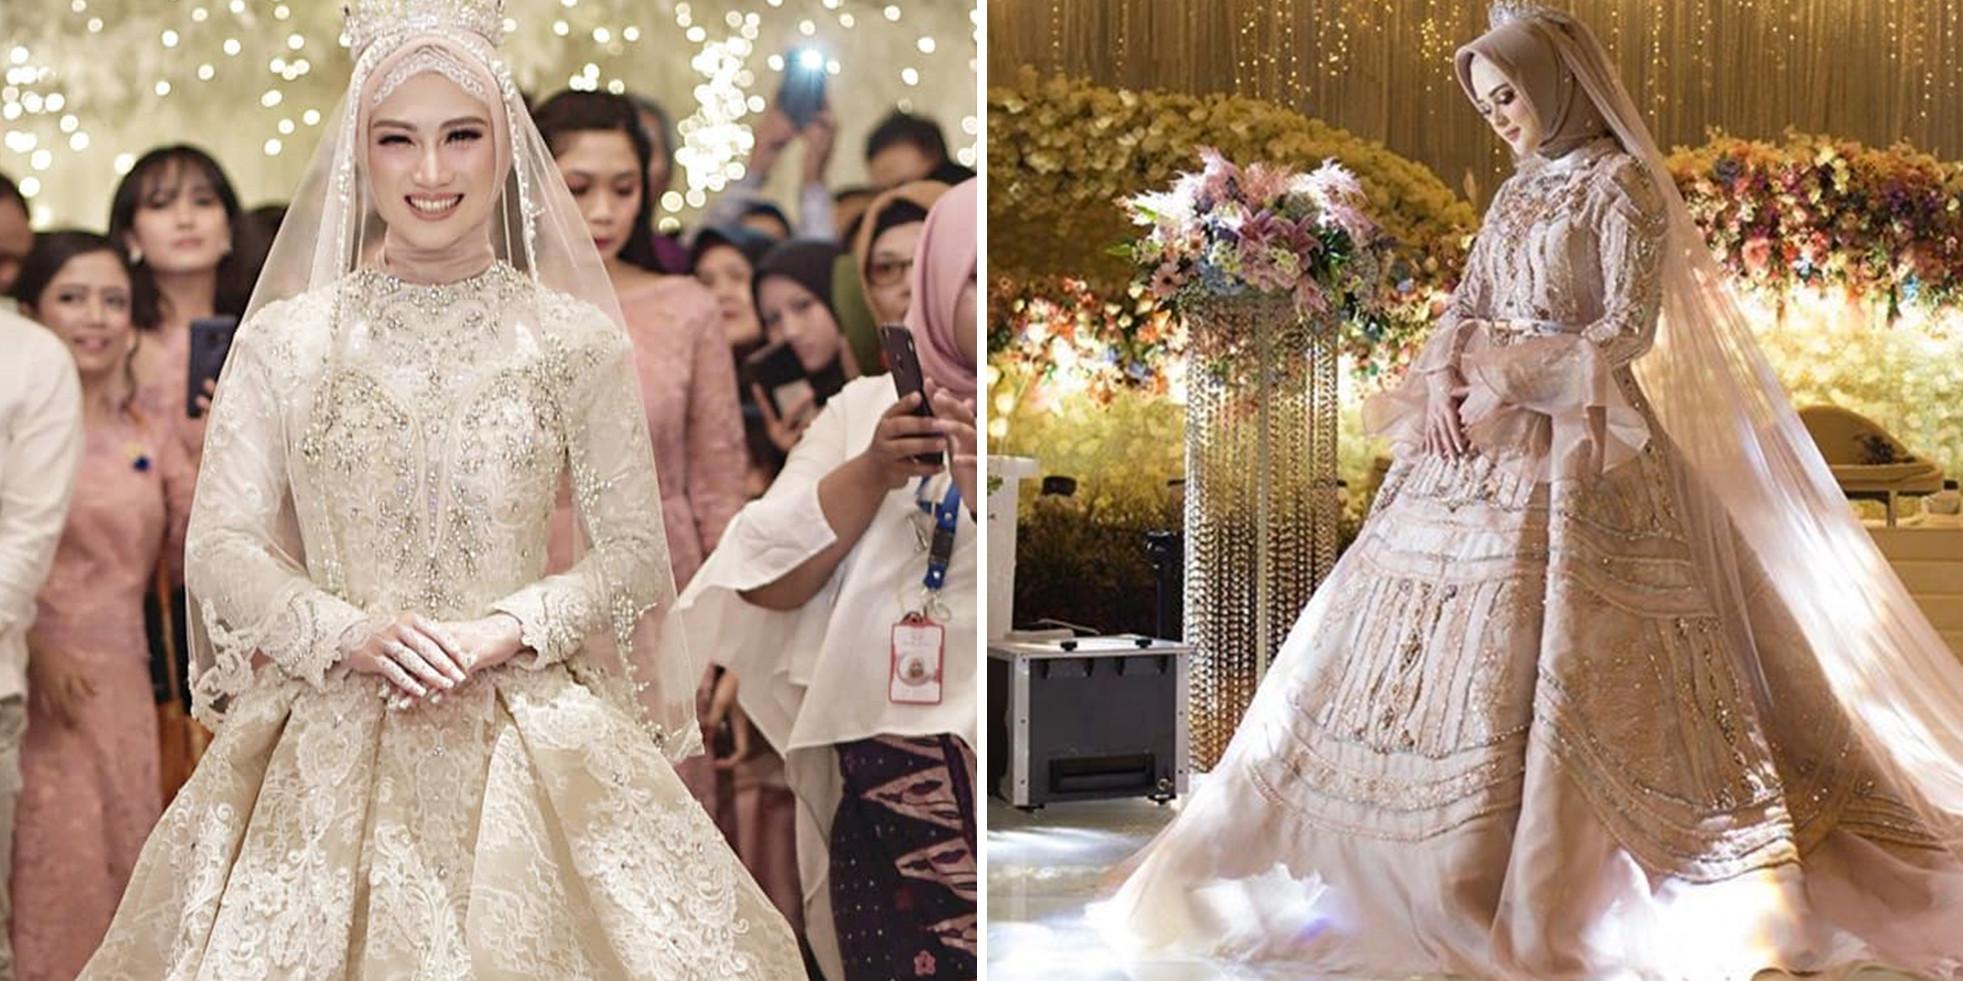 Inspirasi gaun pernikahan 8 seleb berhijab, elegan bak princess